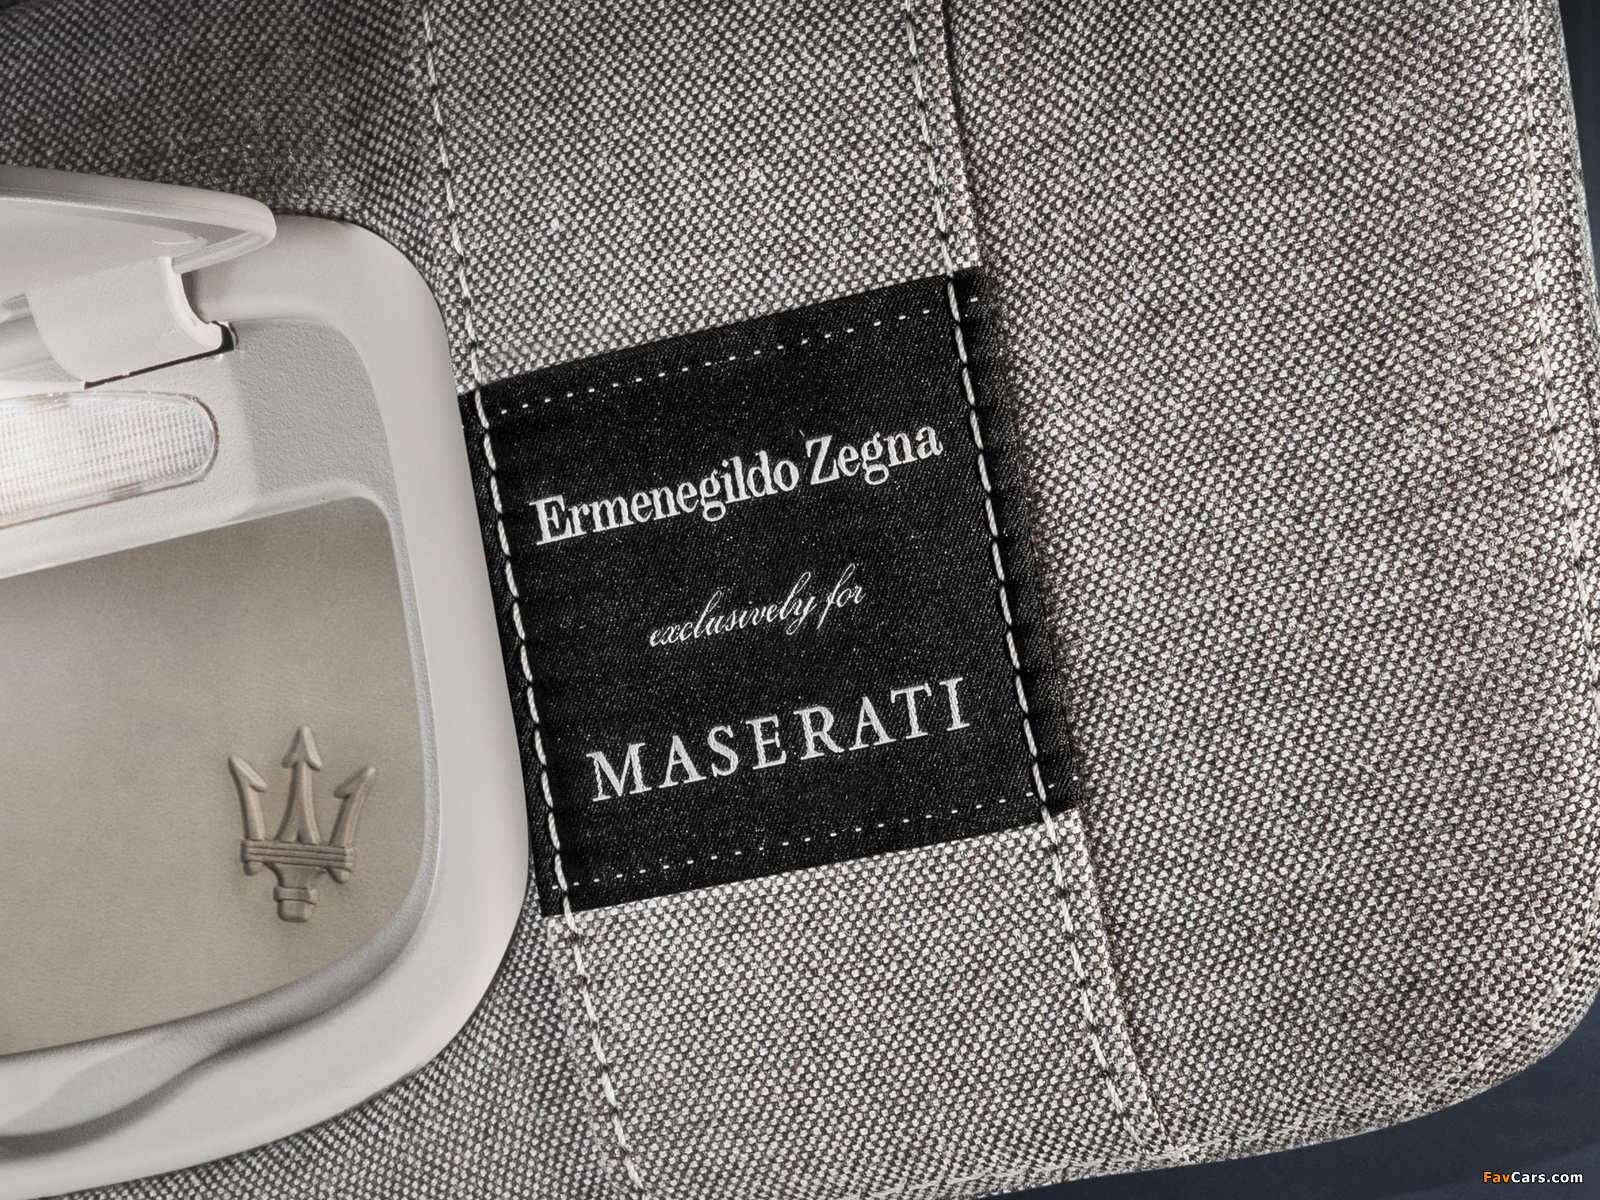 Images of Maserati Quattroporte Ermenegildo Zegna 2014 (1600 x 1200)